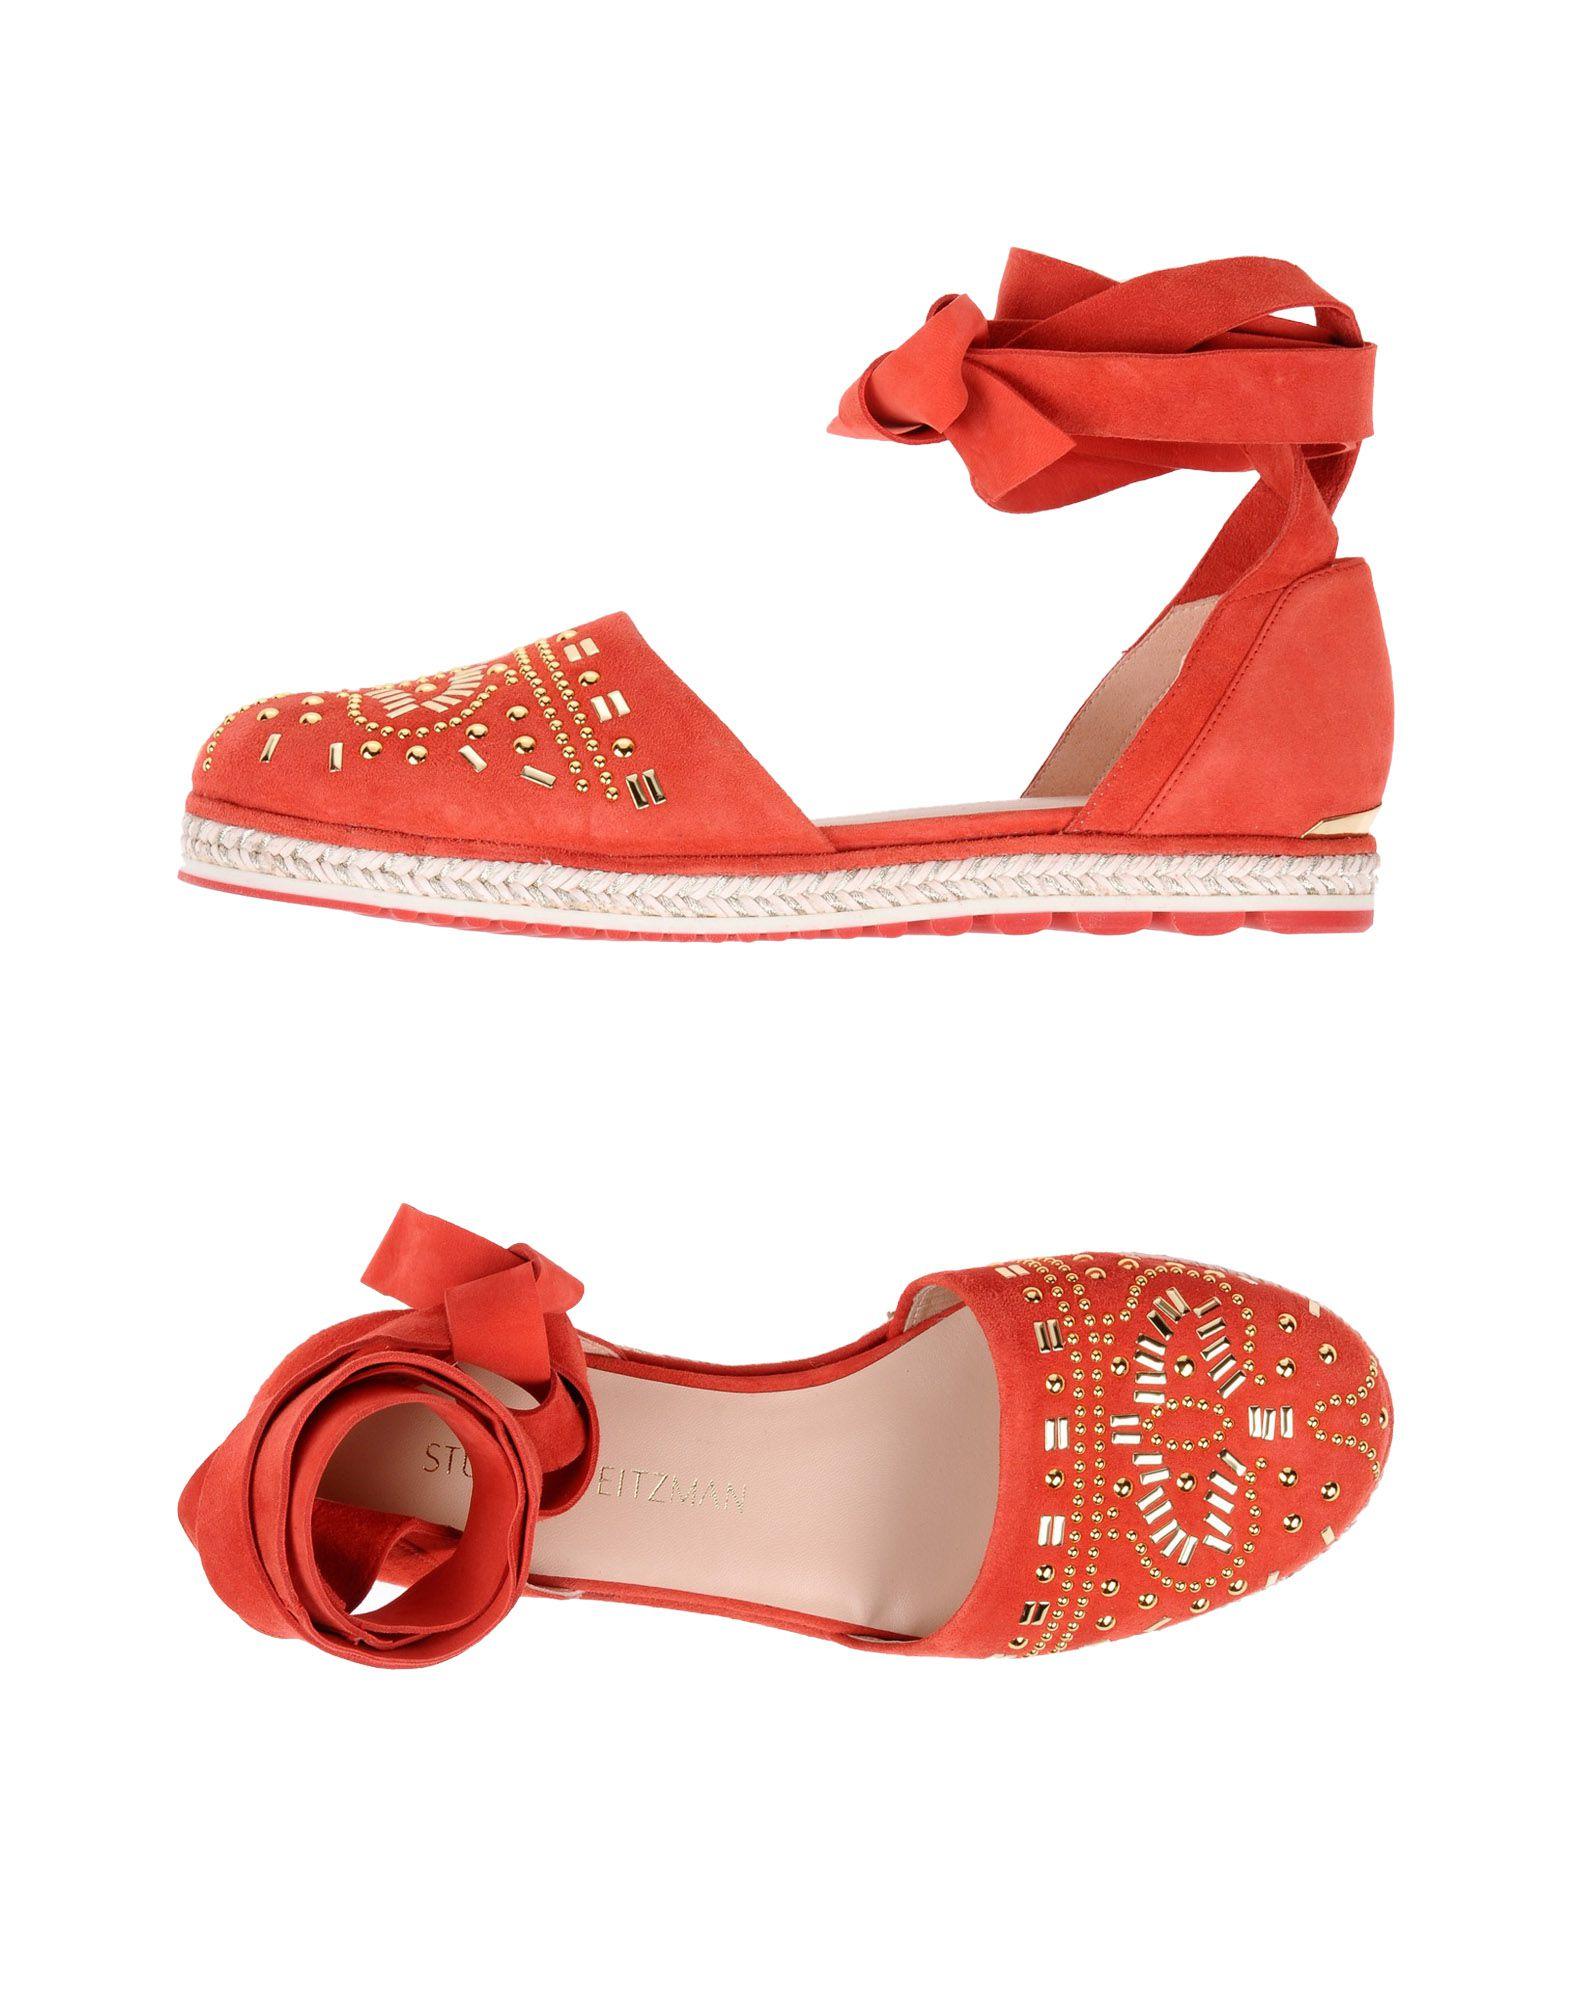 Stuart Weitzman Espadrilles Damen  11338502FN Gute Qualität beliebte Schuhe